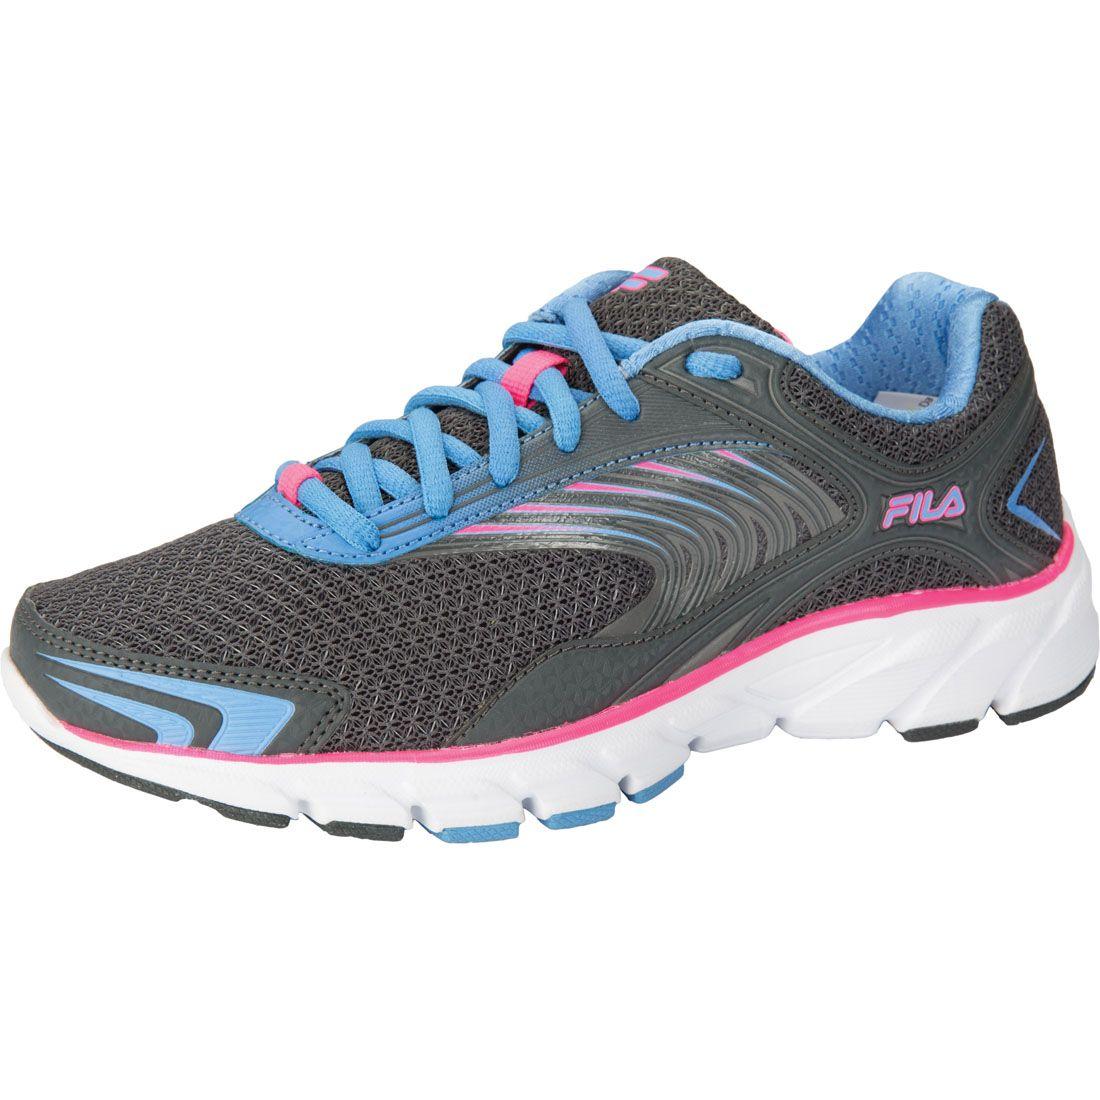 Asics Women's Footwear Premium Athletic Pink Glow/ White/ Pink Ribbon  | Shoes | Pinterest | Asics women, Footwear and Athletics